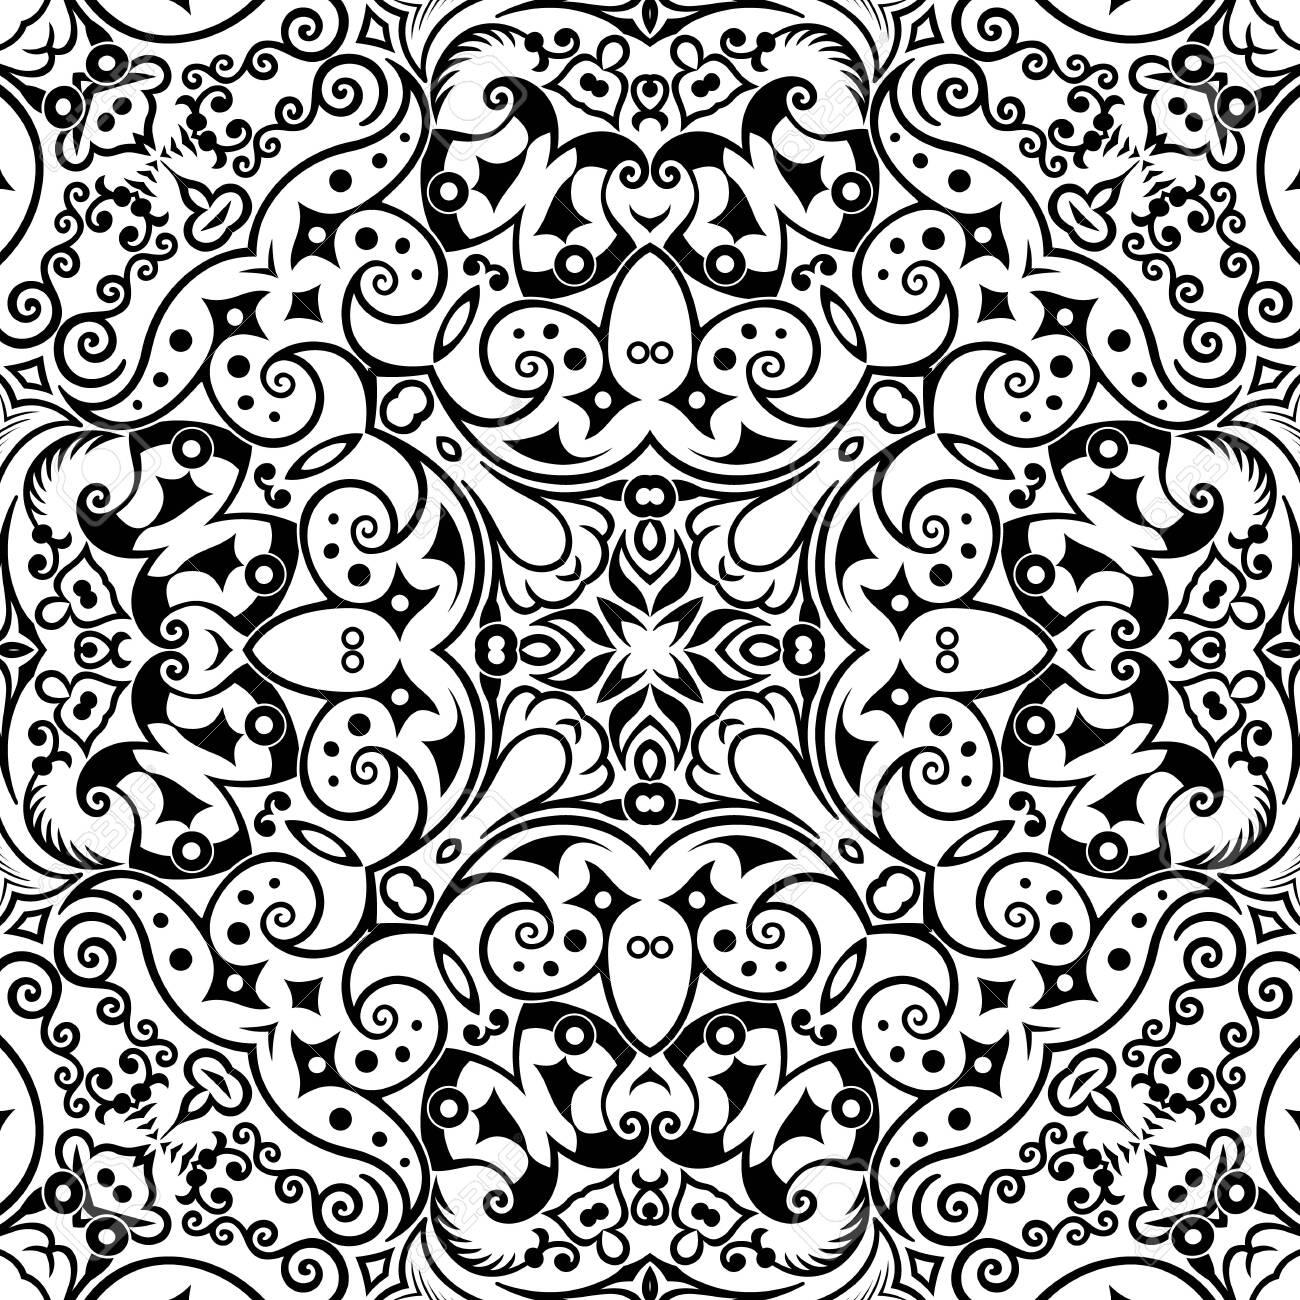 Vector ethnic hand drawn ornamental background. - 152225827